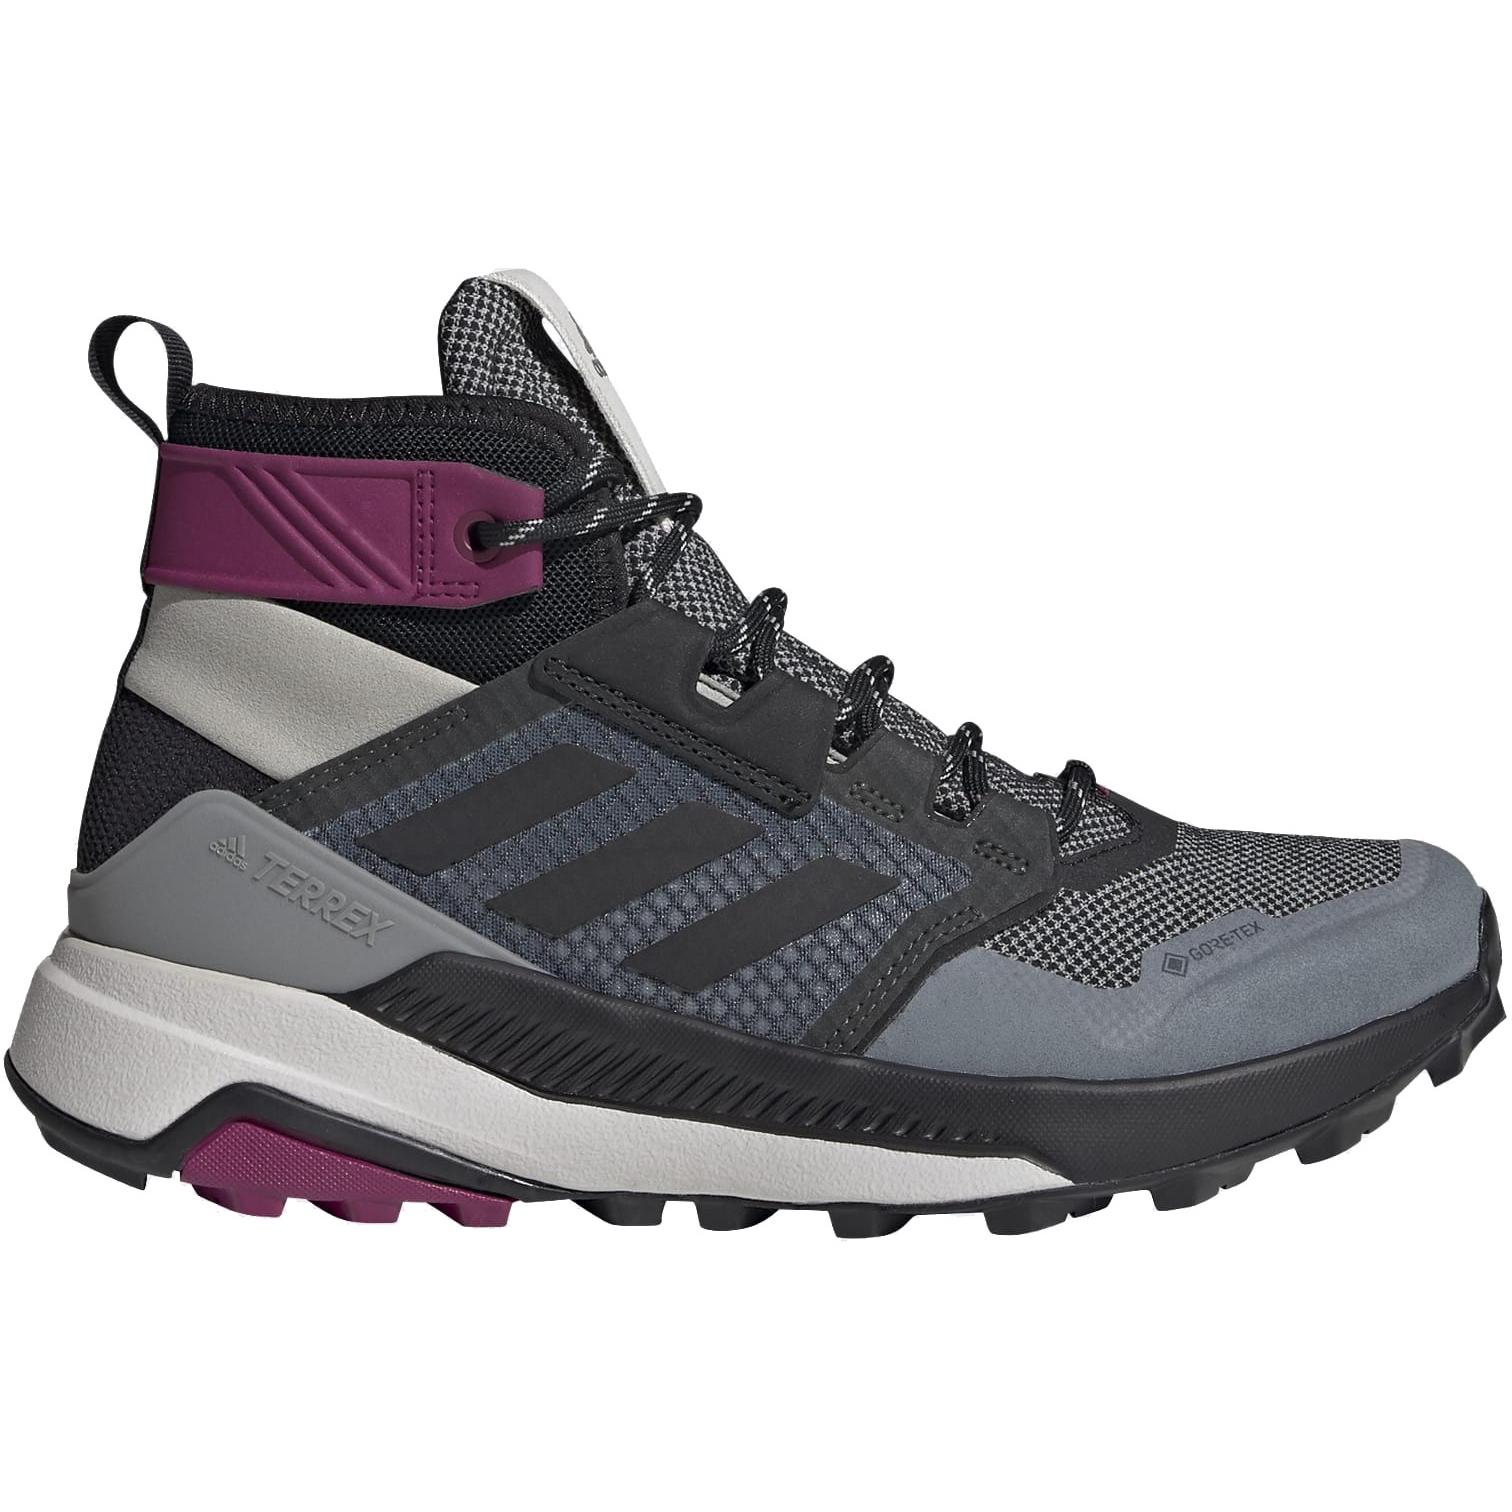 adidas Frauen TERREX Trailmaker Mid GORE-TEX Wanderschuhe - metal grey/core black/power berry FY2236